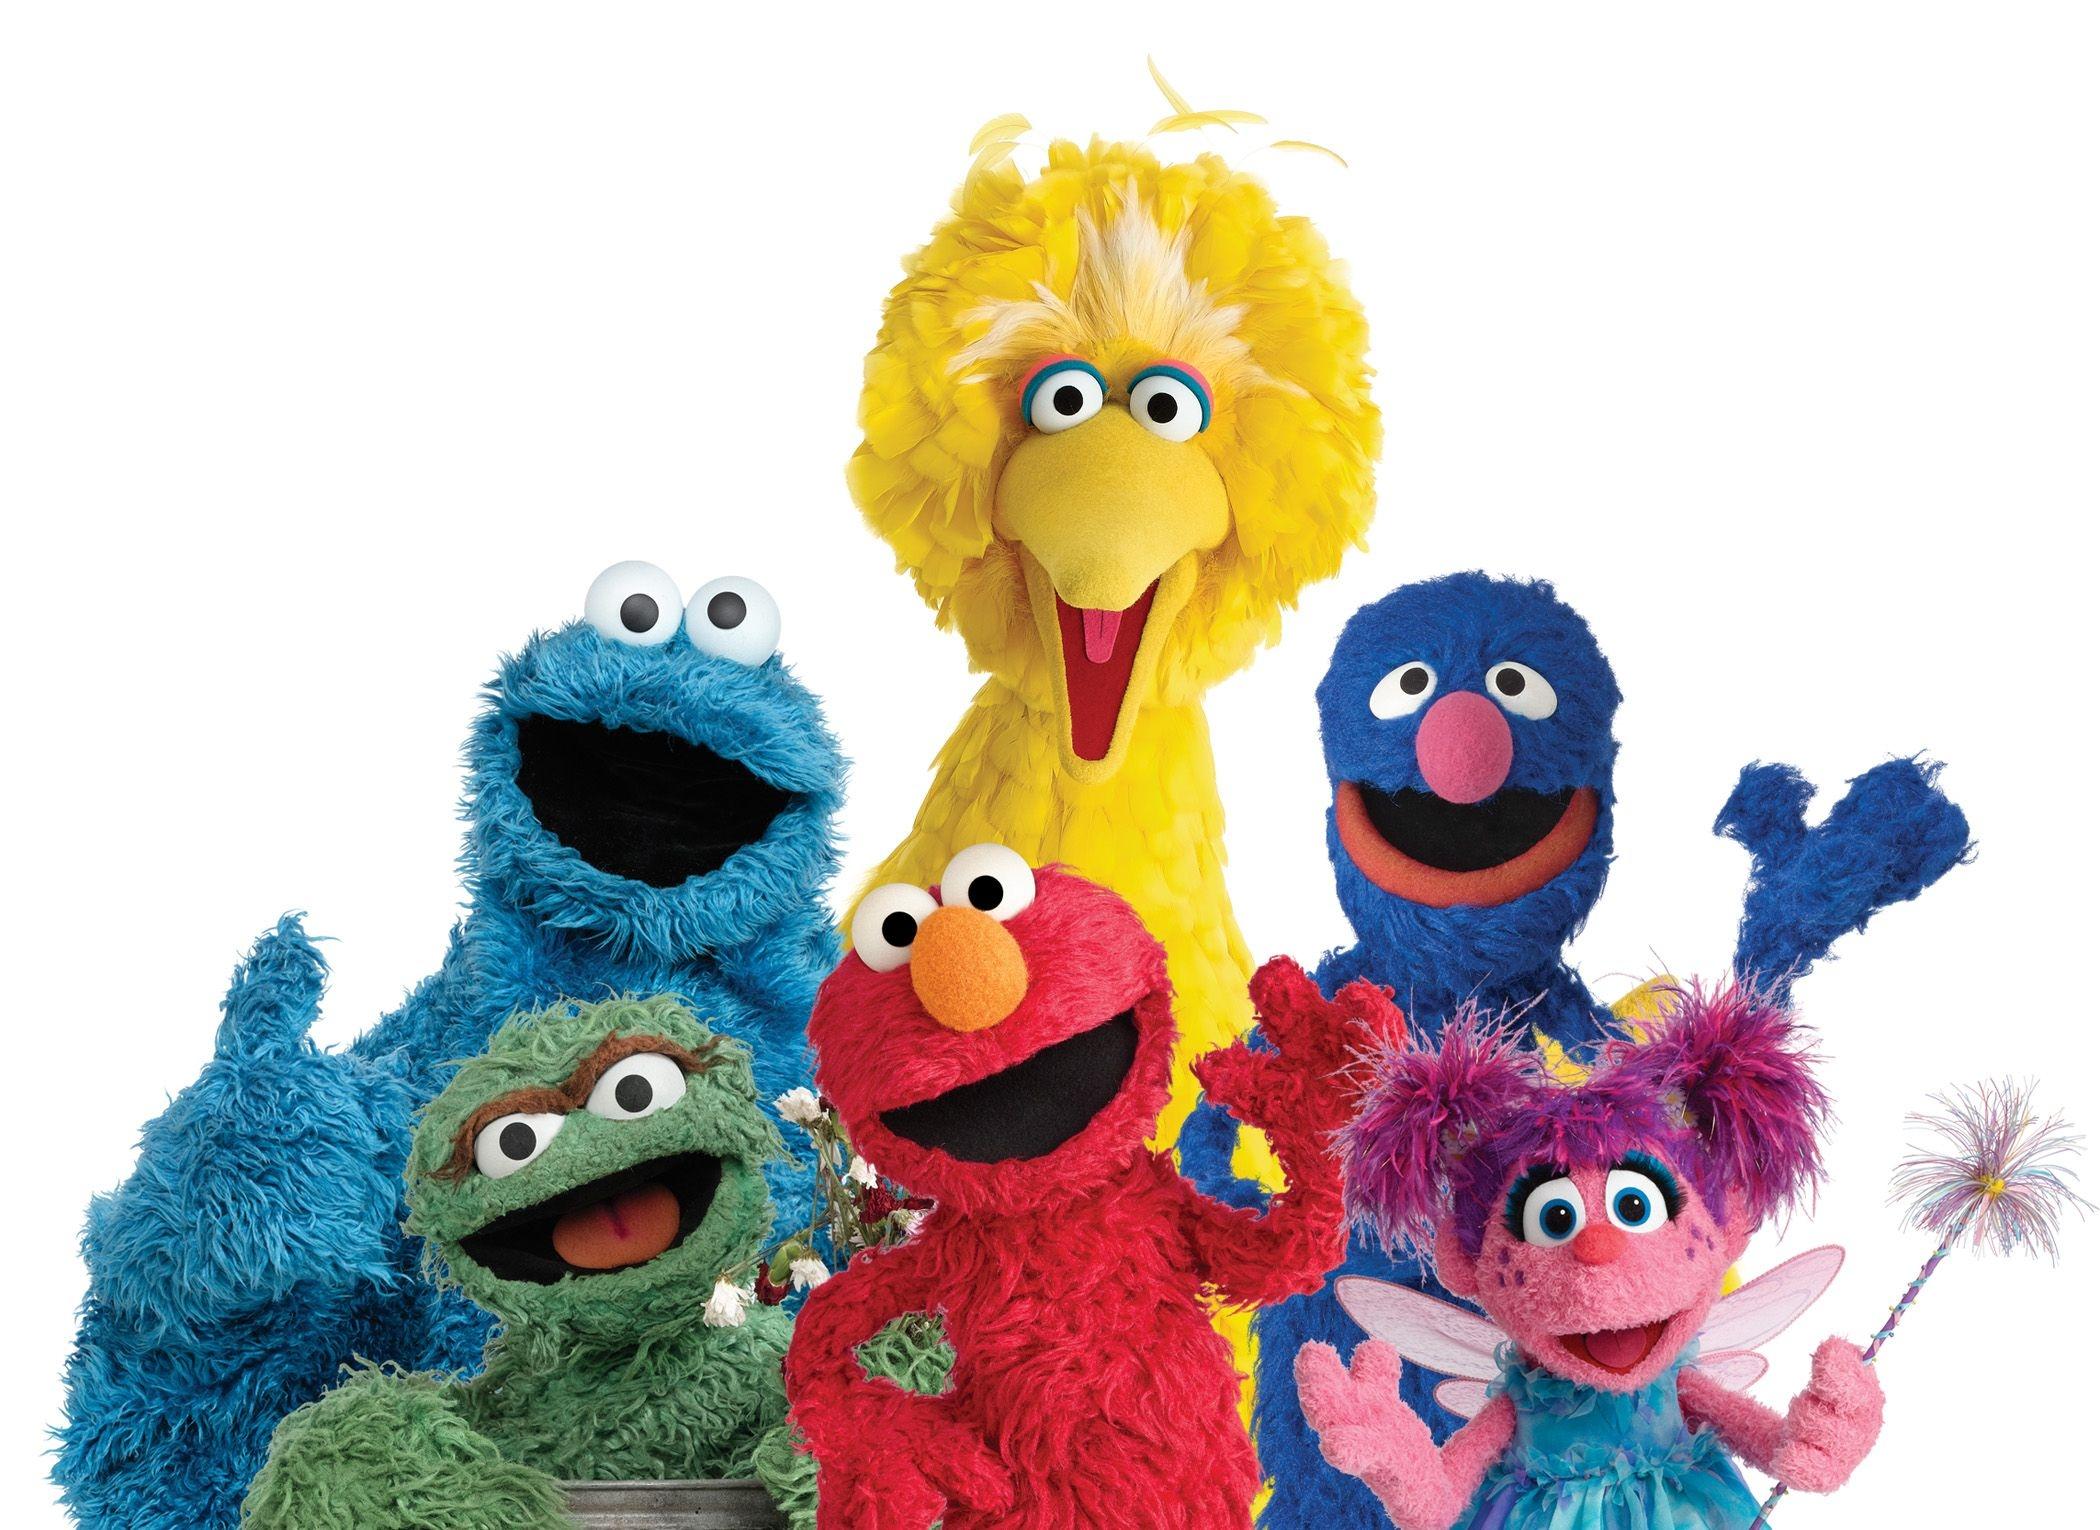 Kidscreen » Archive » Chromecast adds Sesame Street, Nickelodeon content